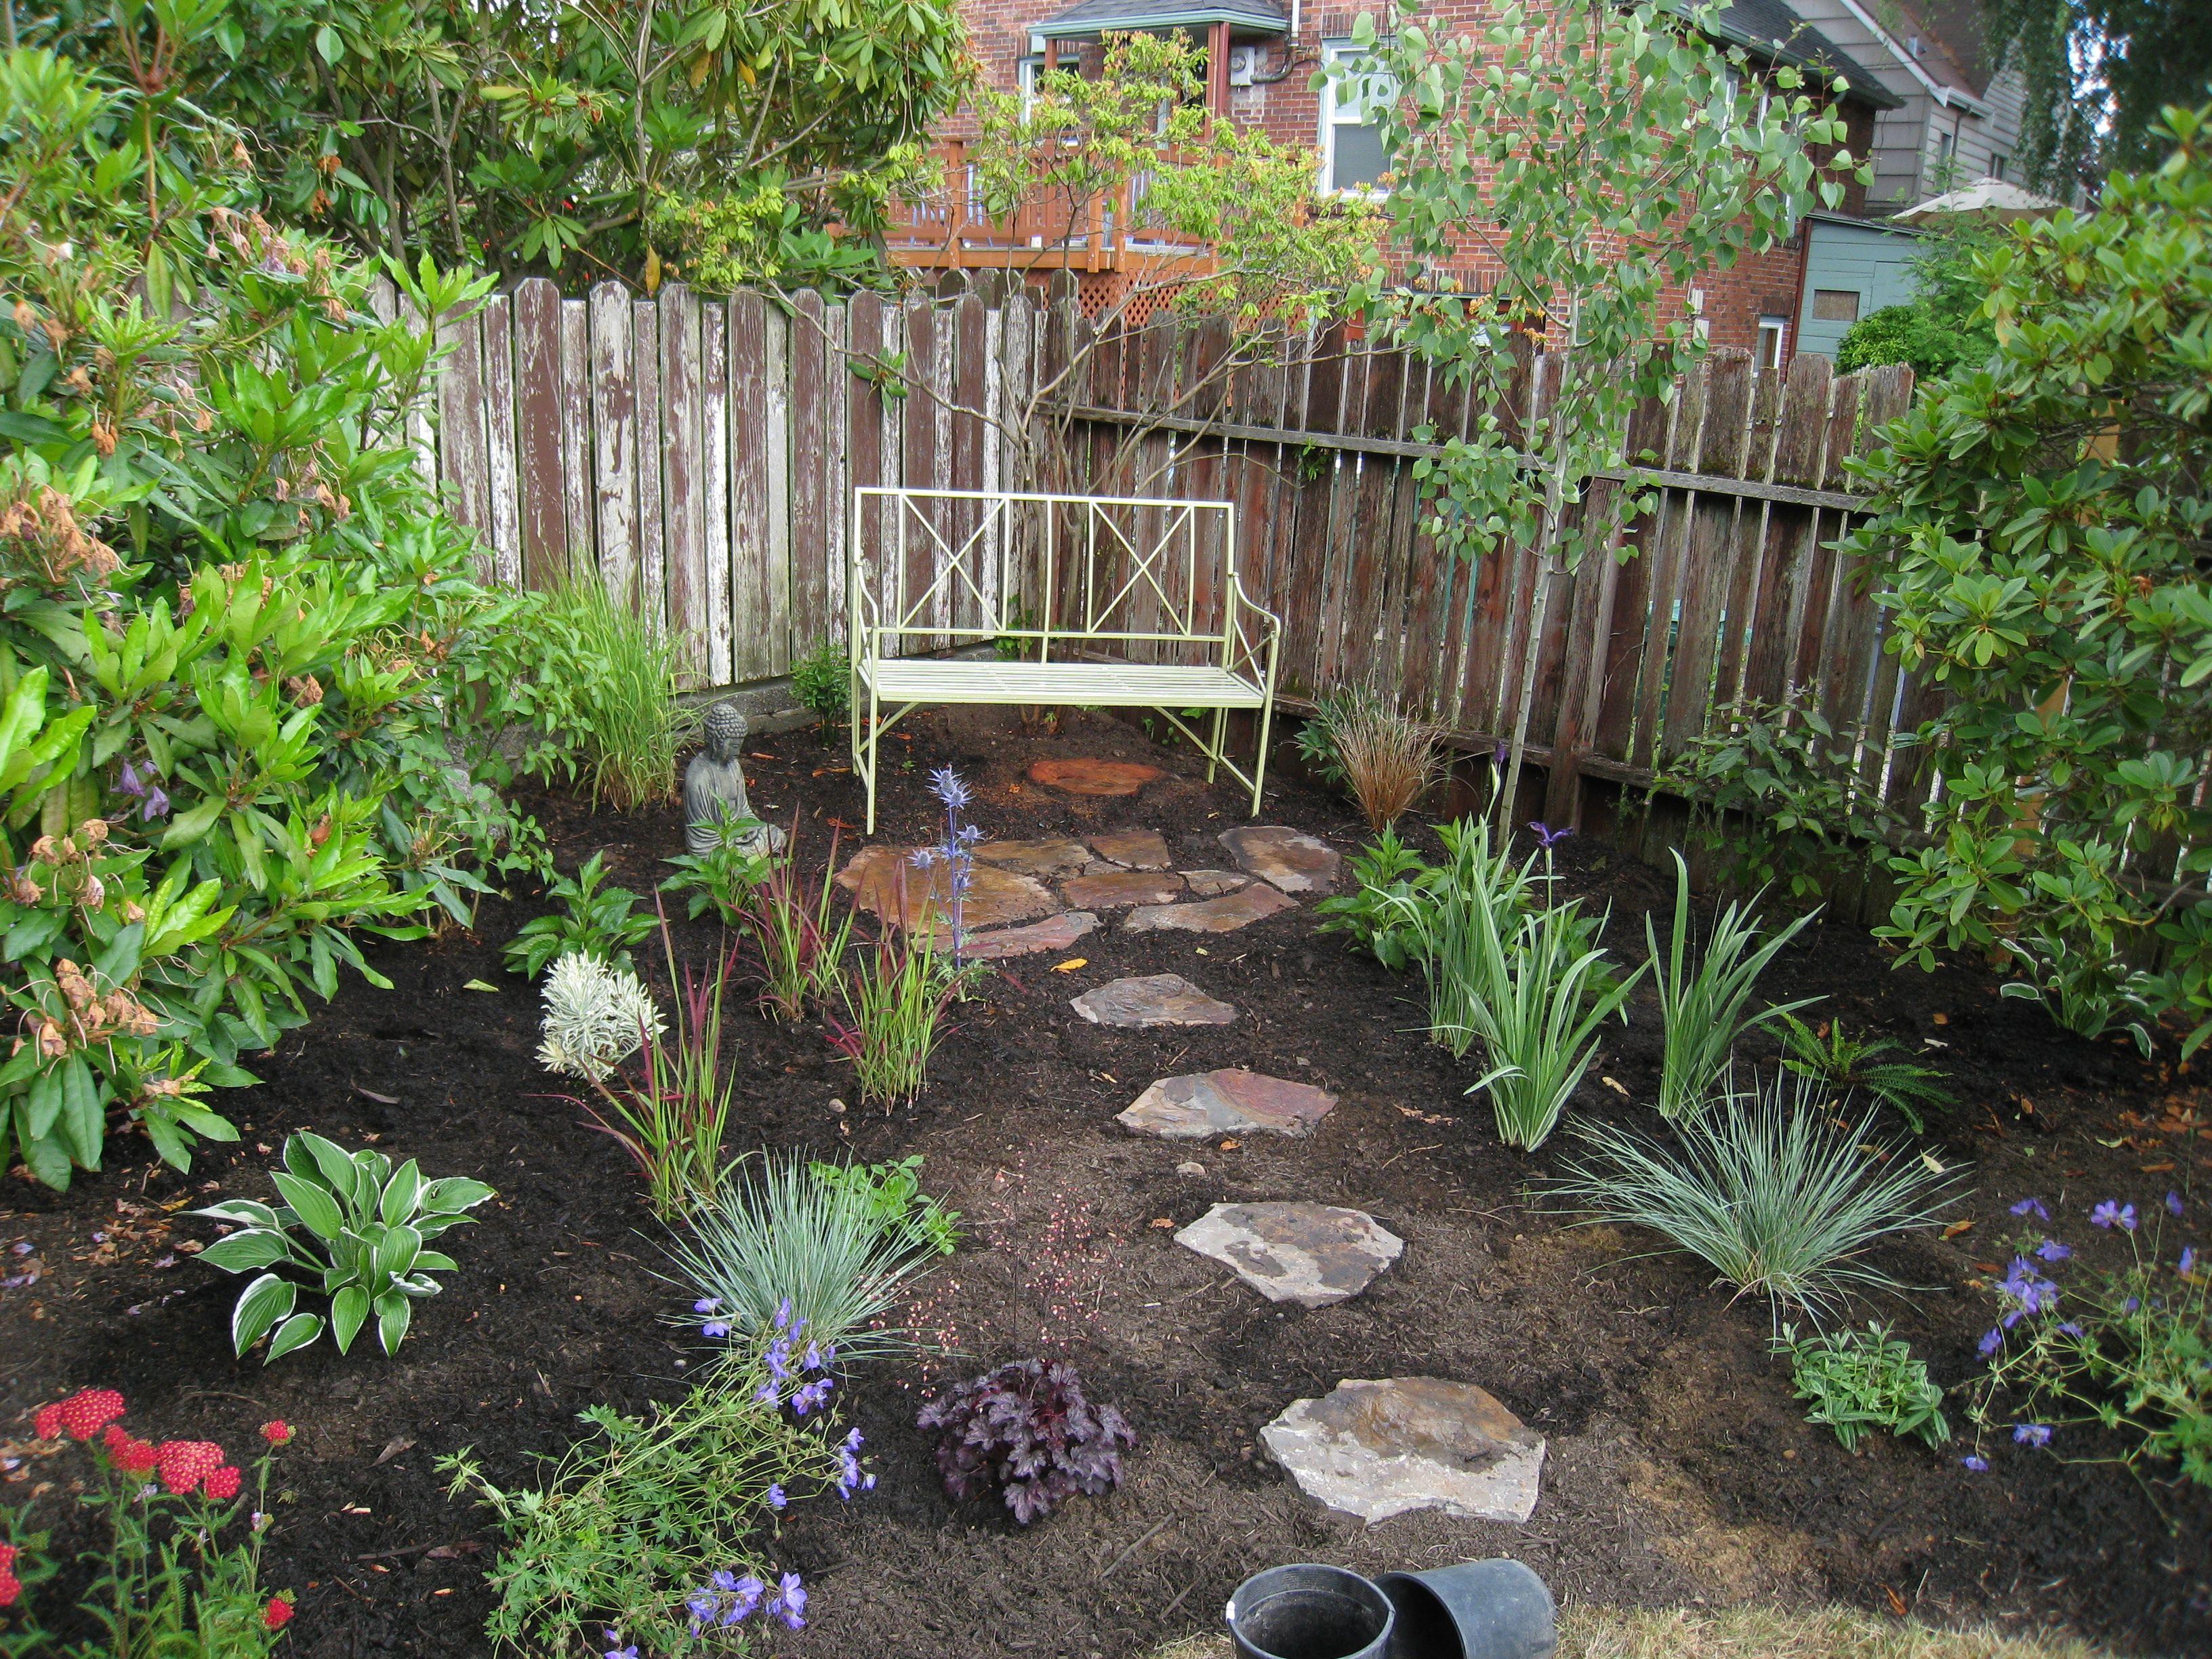 Meditation corner. | Meditation Garden Idea's | Pinterest on Meditation Patio Ideas id=54432